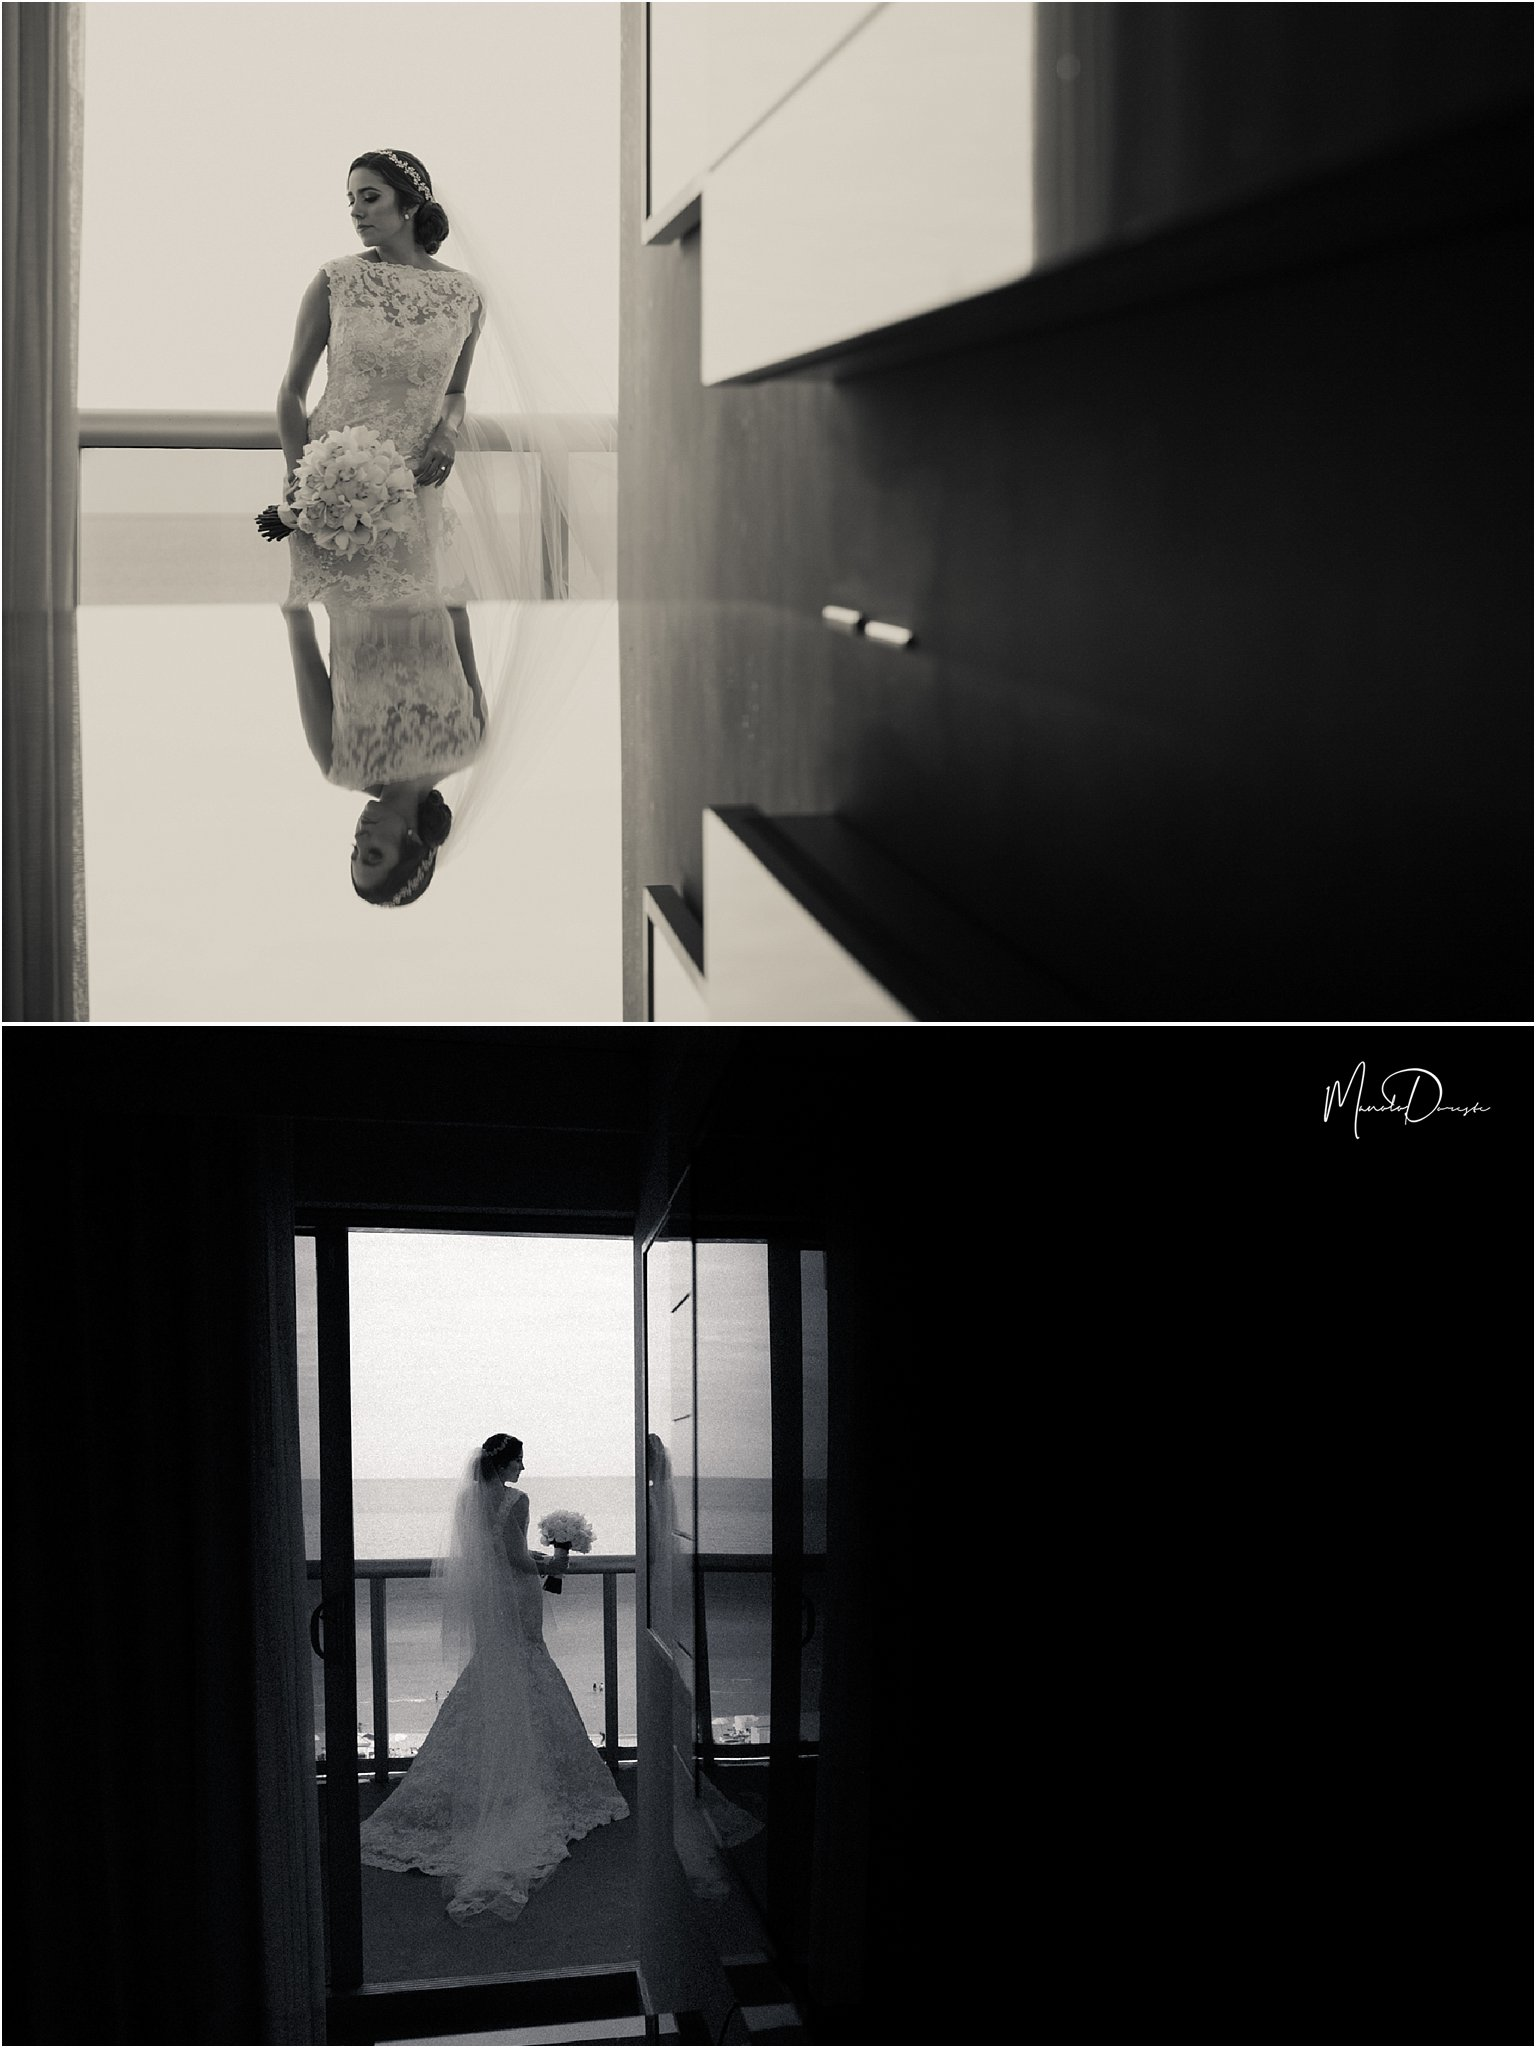 00930_ManoloDoreste_InFocusStudios_Wedding_Family_Photography_Miami_MiamiPhotographer.jpg